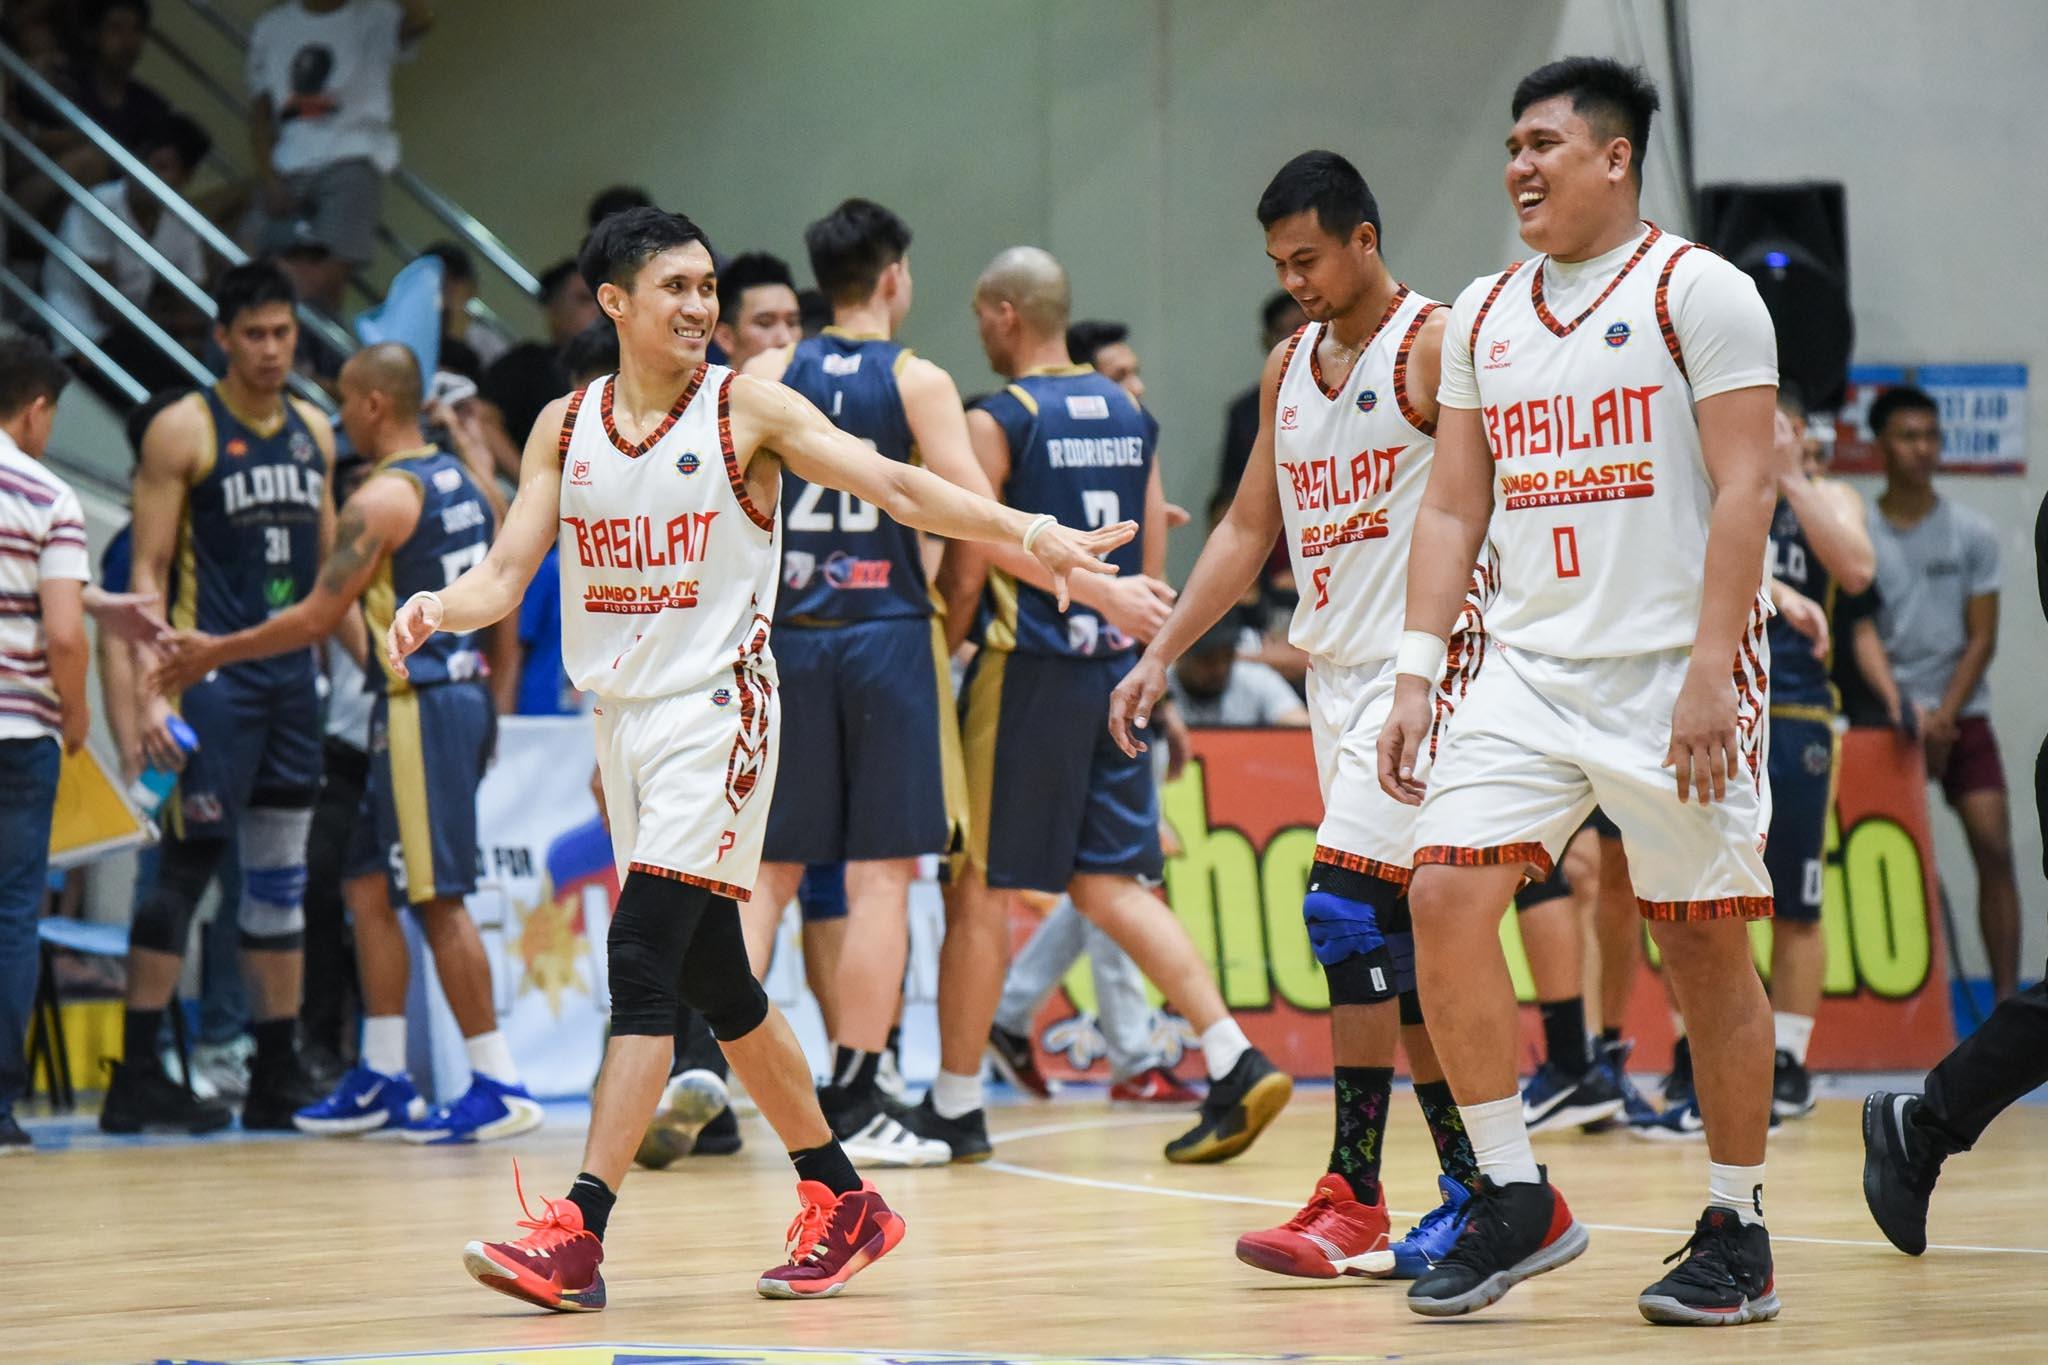 MPBL-2019-2020-Basilan-vs.-Iloilo-5TH-PHOTO-BASILAN With Bulanadi in Gilas, Jhaps Bautista steps up for Basilan Basketball MPBL News  - philippine sports news